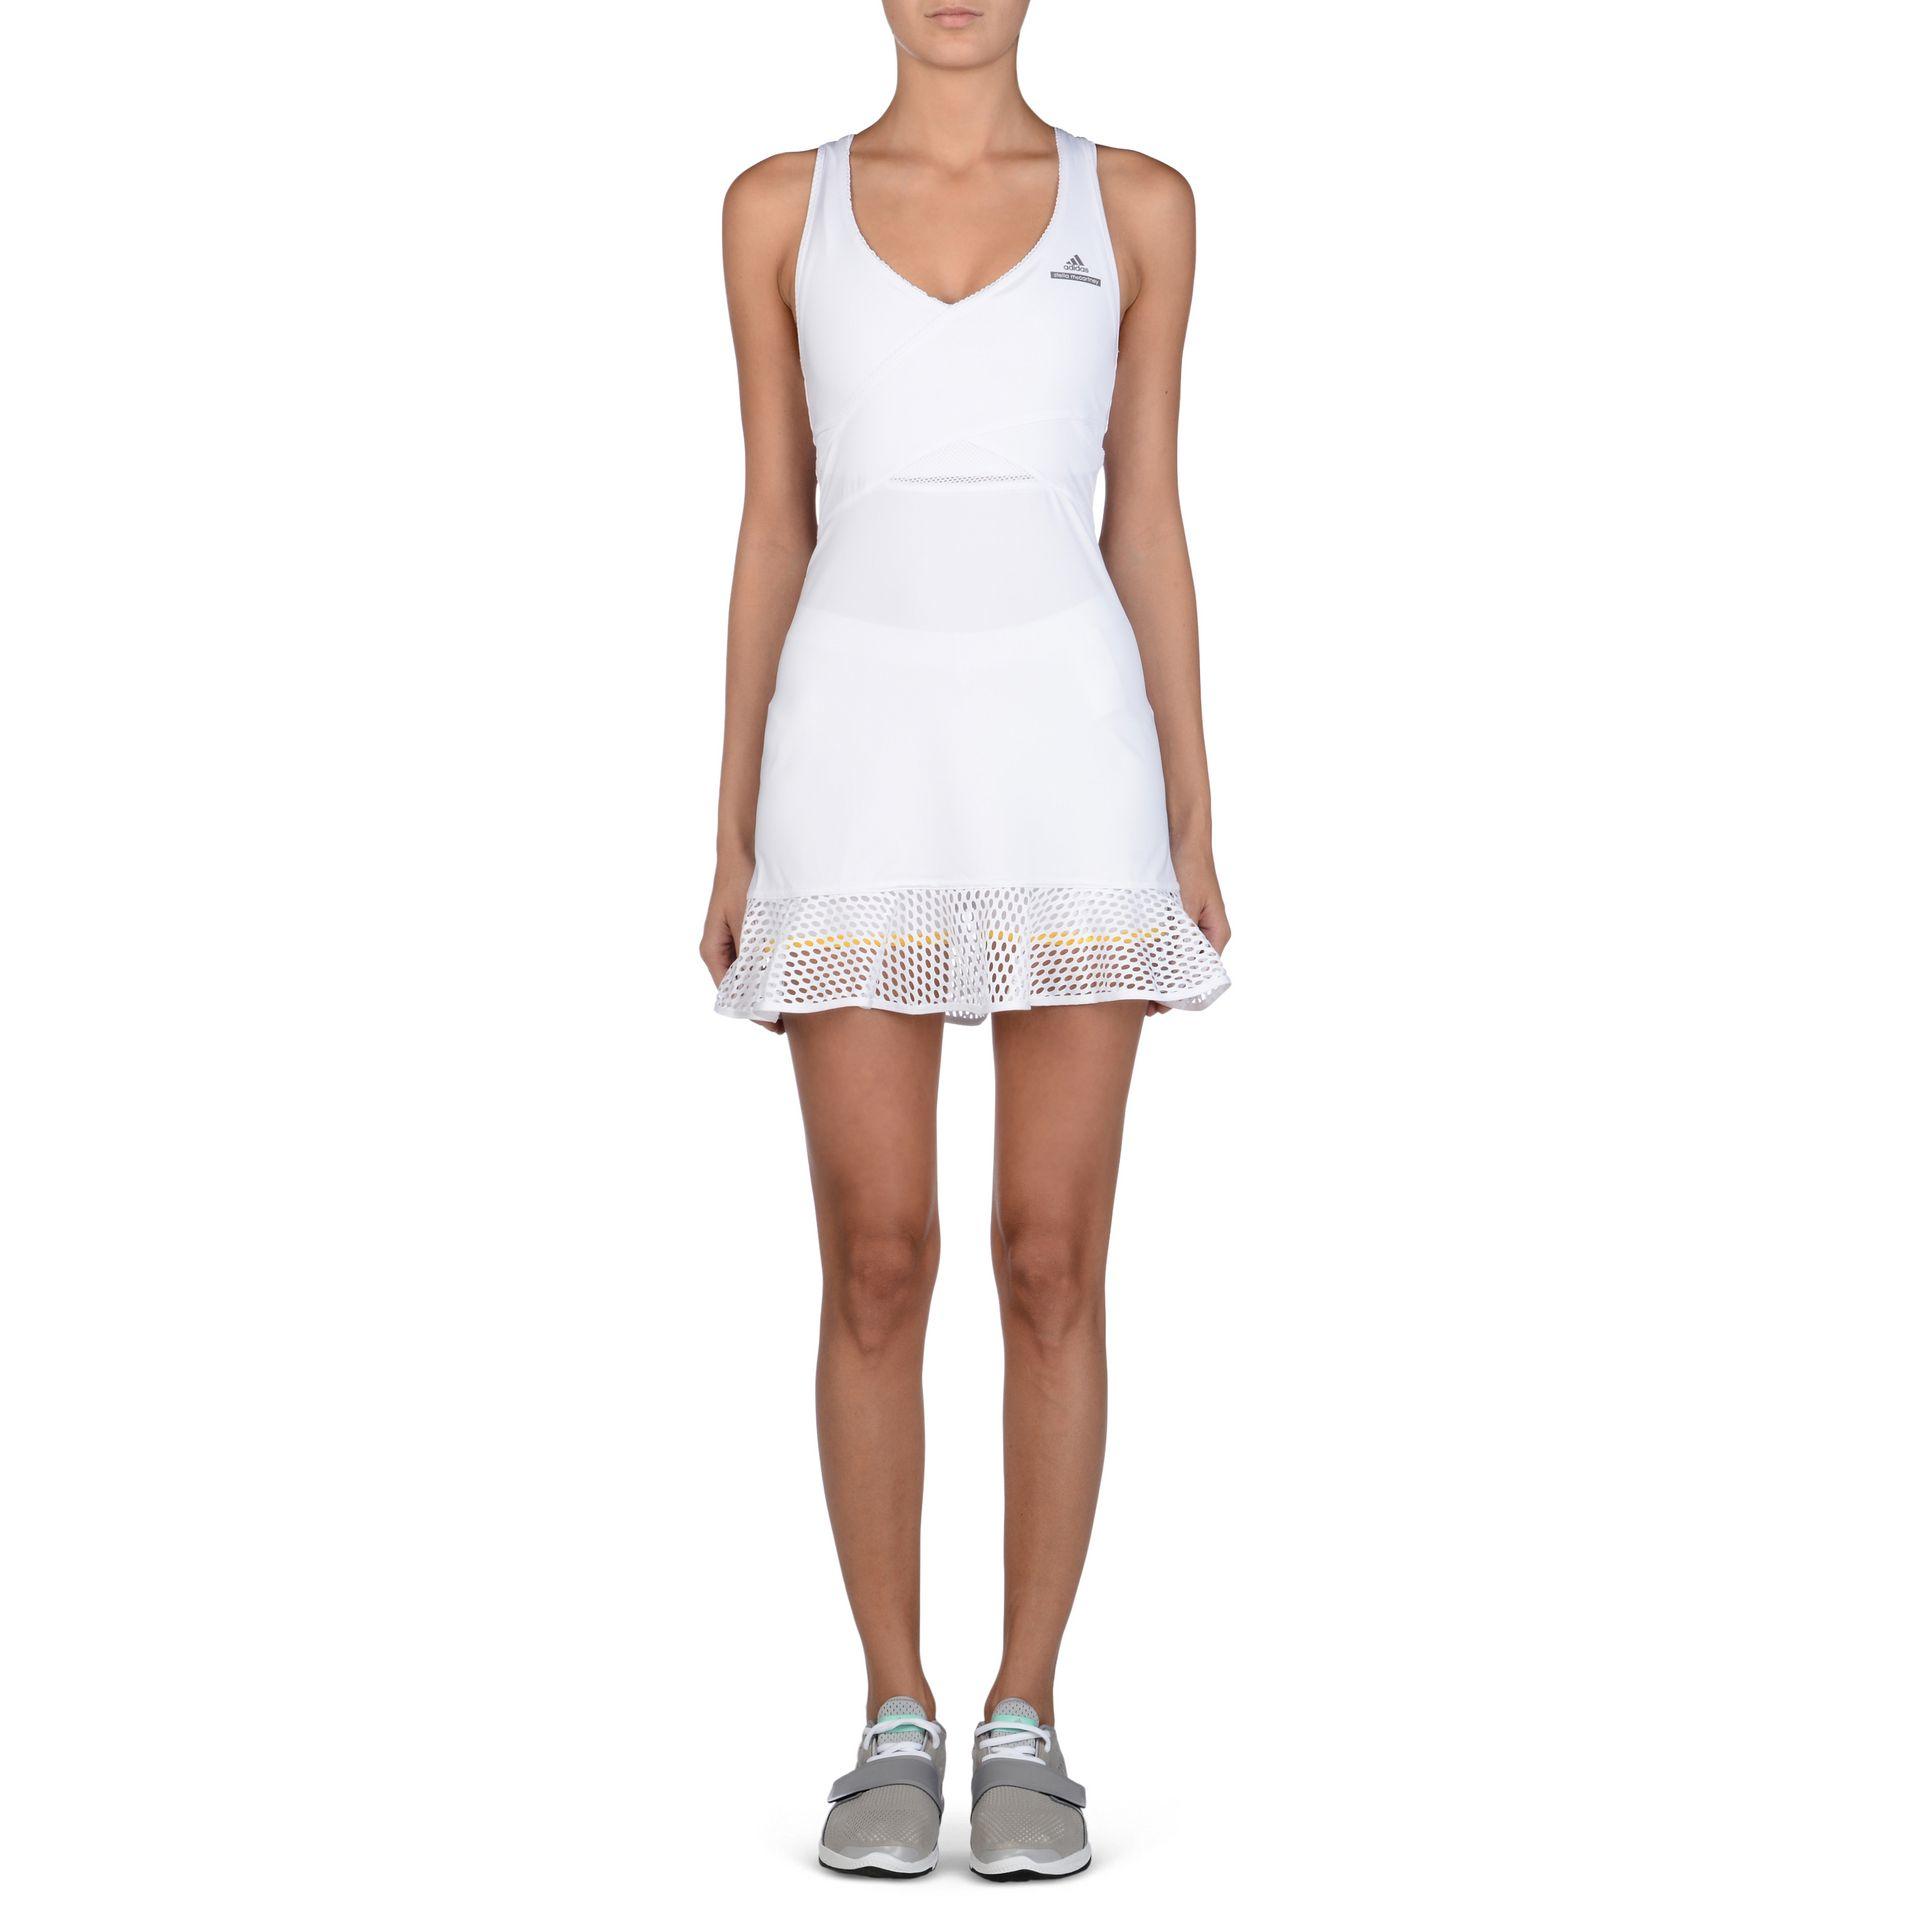 adidas Women's Fall Stella McCartney Jacket Tennis